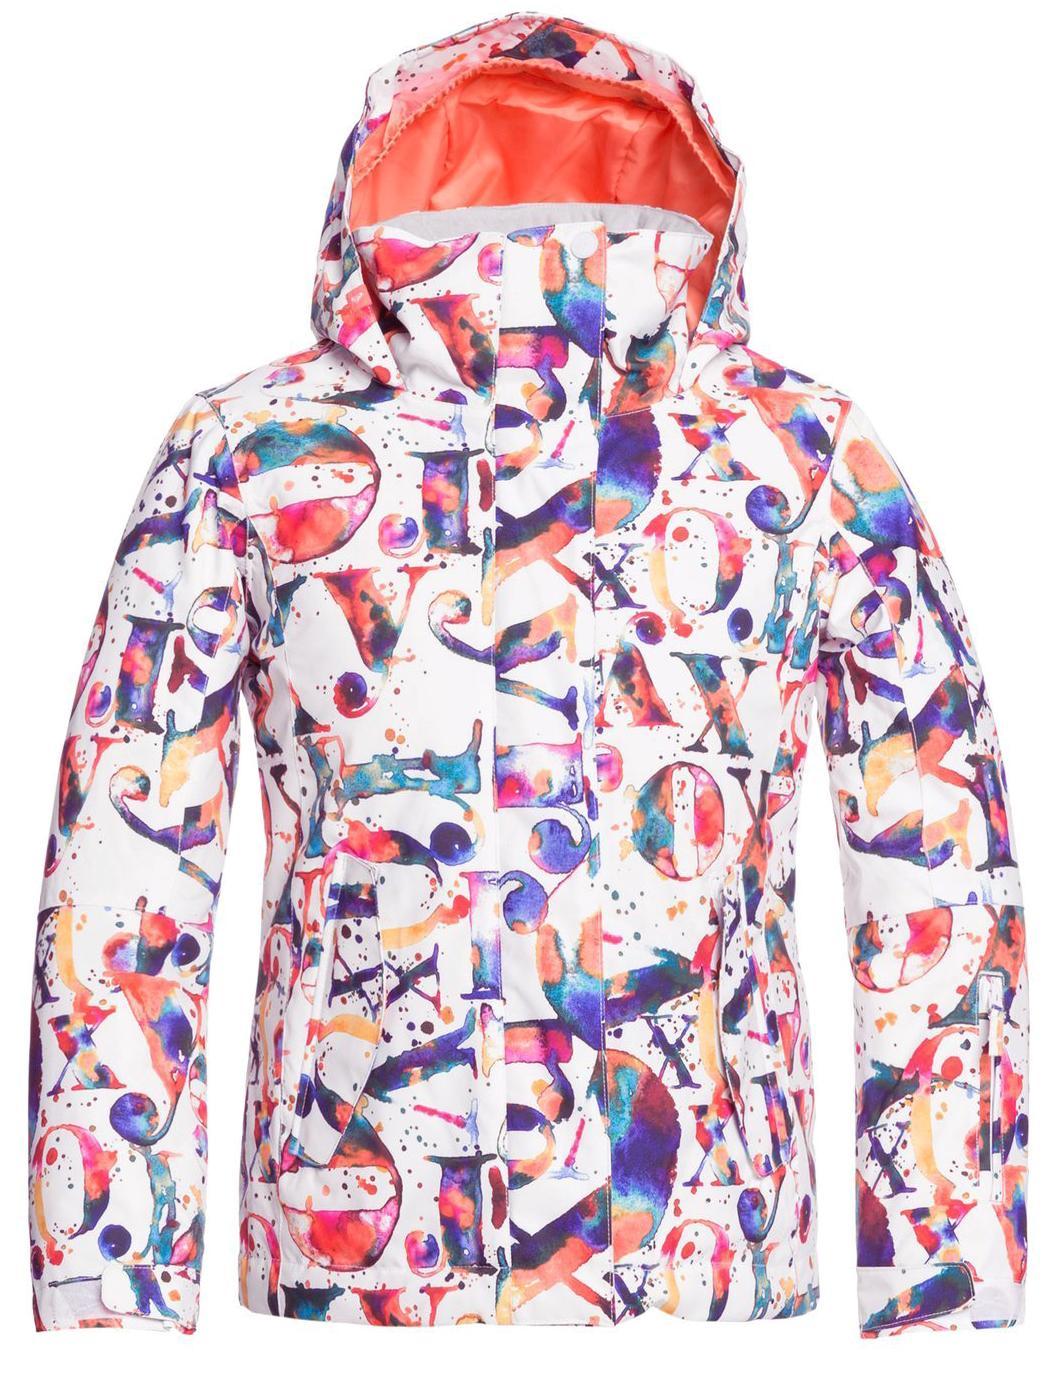 Куртка Сноубордическая Roxy 2020-21 Rx Jetty Bright White Magic Carpet (Возраст:16)